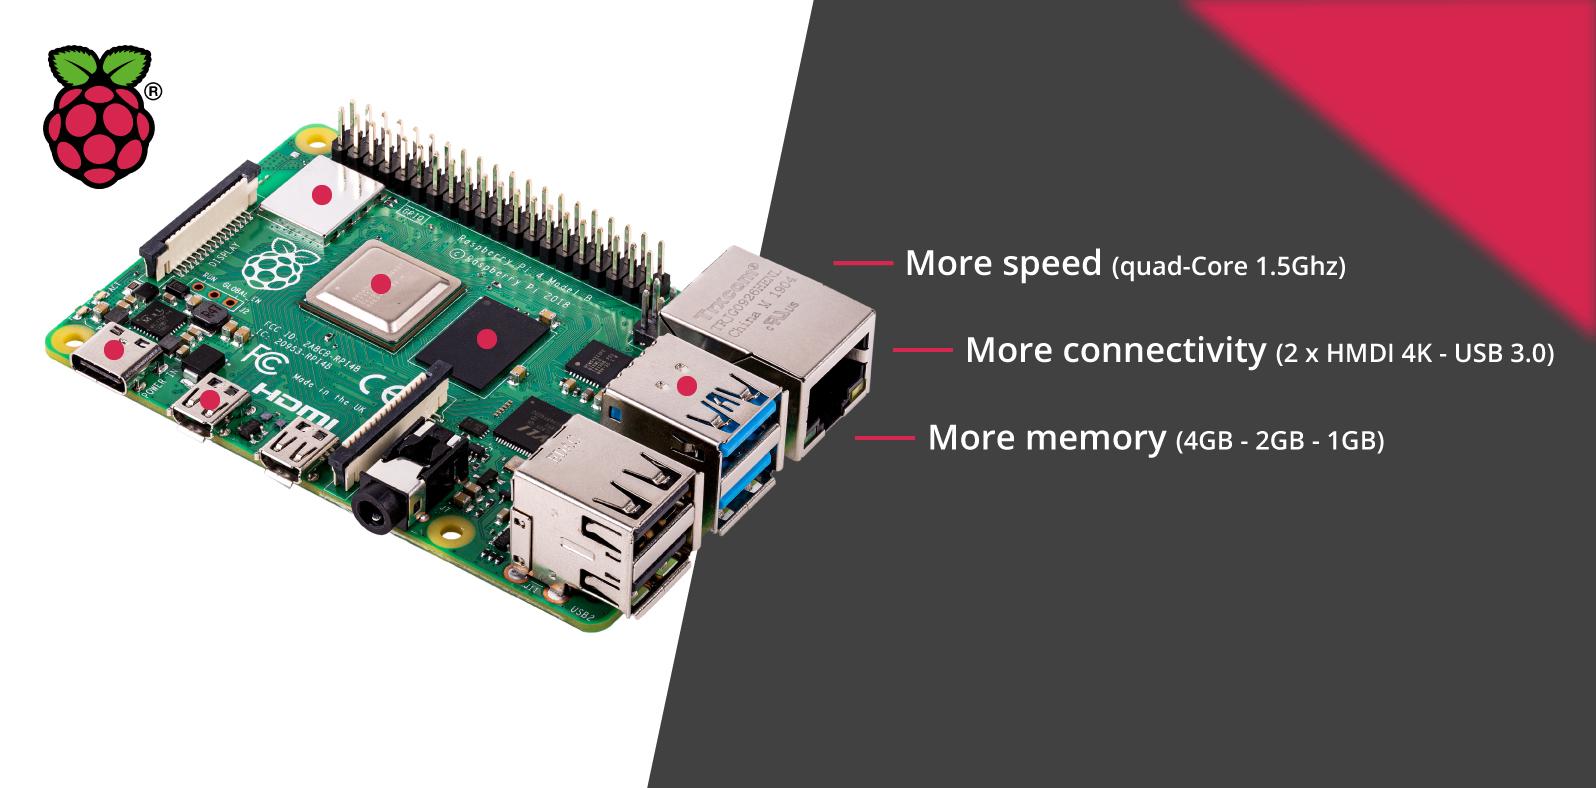 Yadom presents the new Raspberry Pi 4 b